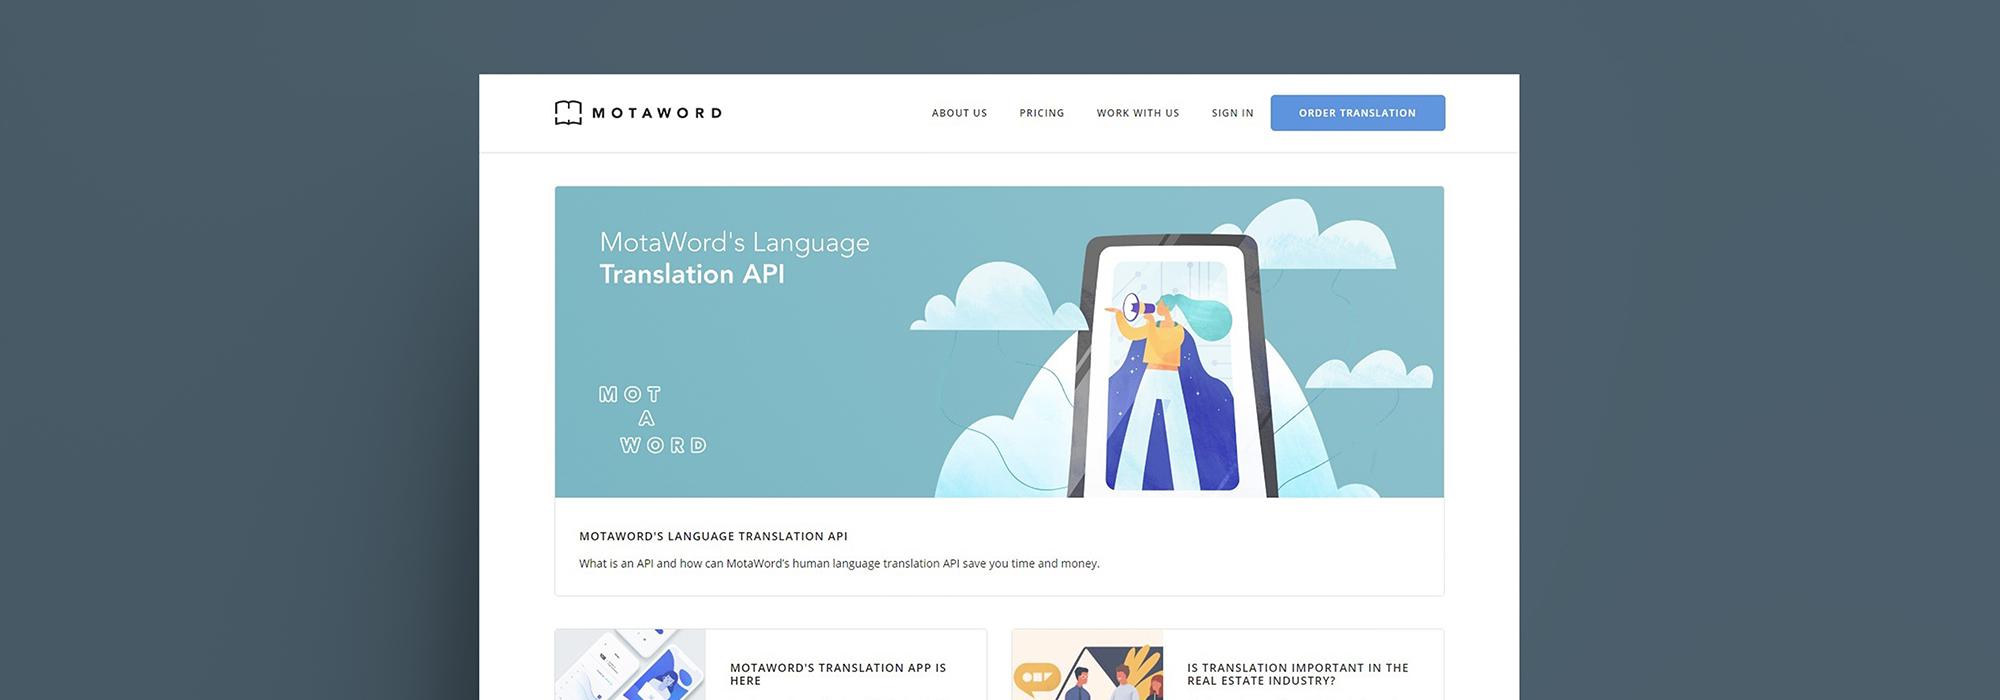 Blog - MotaWord